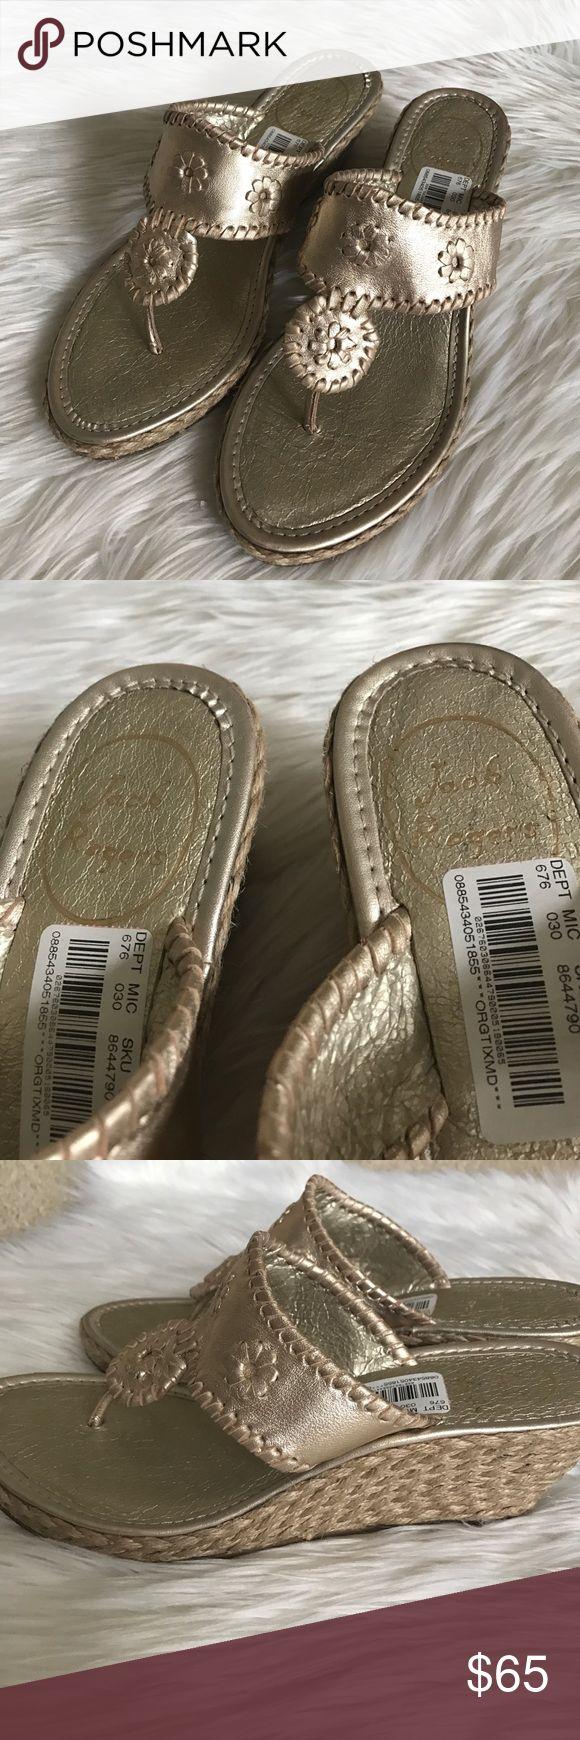 {Jack Rogers} Marbella Mid Wedge {Jack Rogers} Marbella Mid Wedge in Platinum. Size: 7.5. New, never worn. Jack Rogers Shoes Wedges